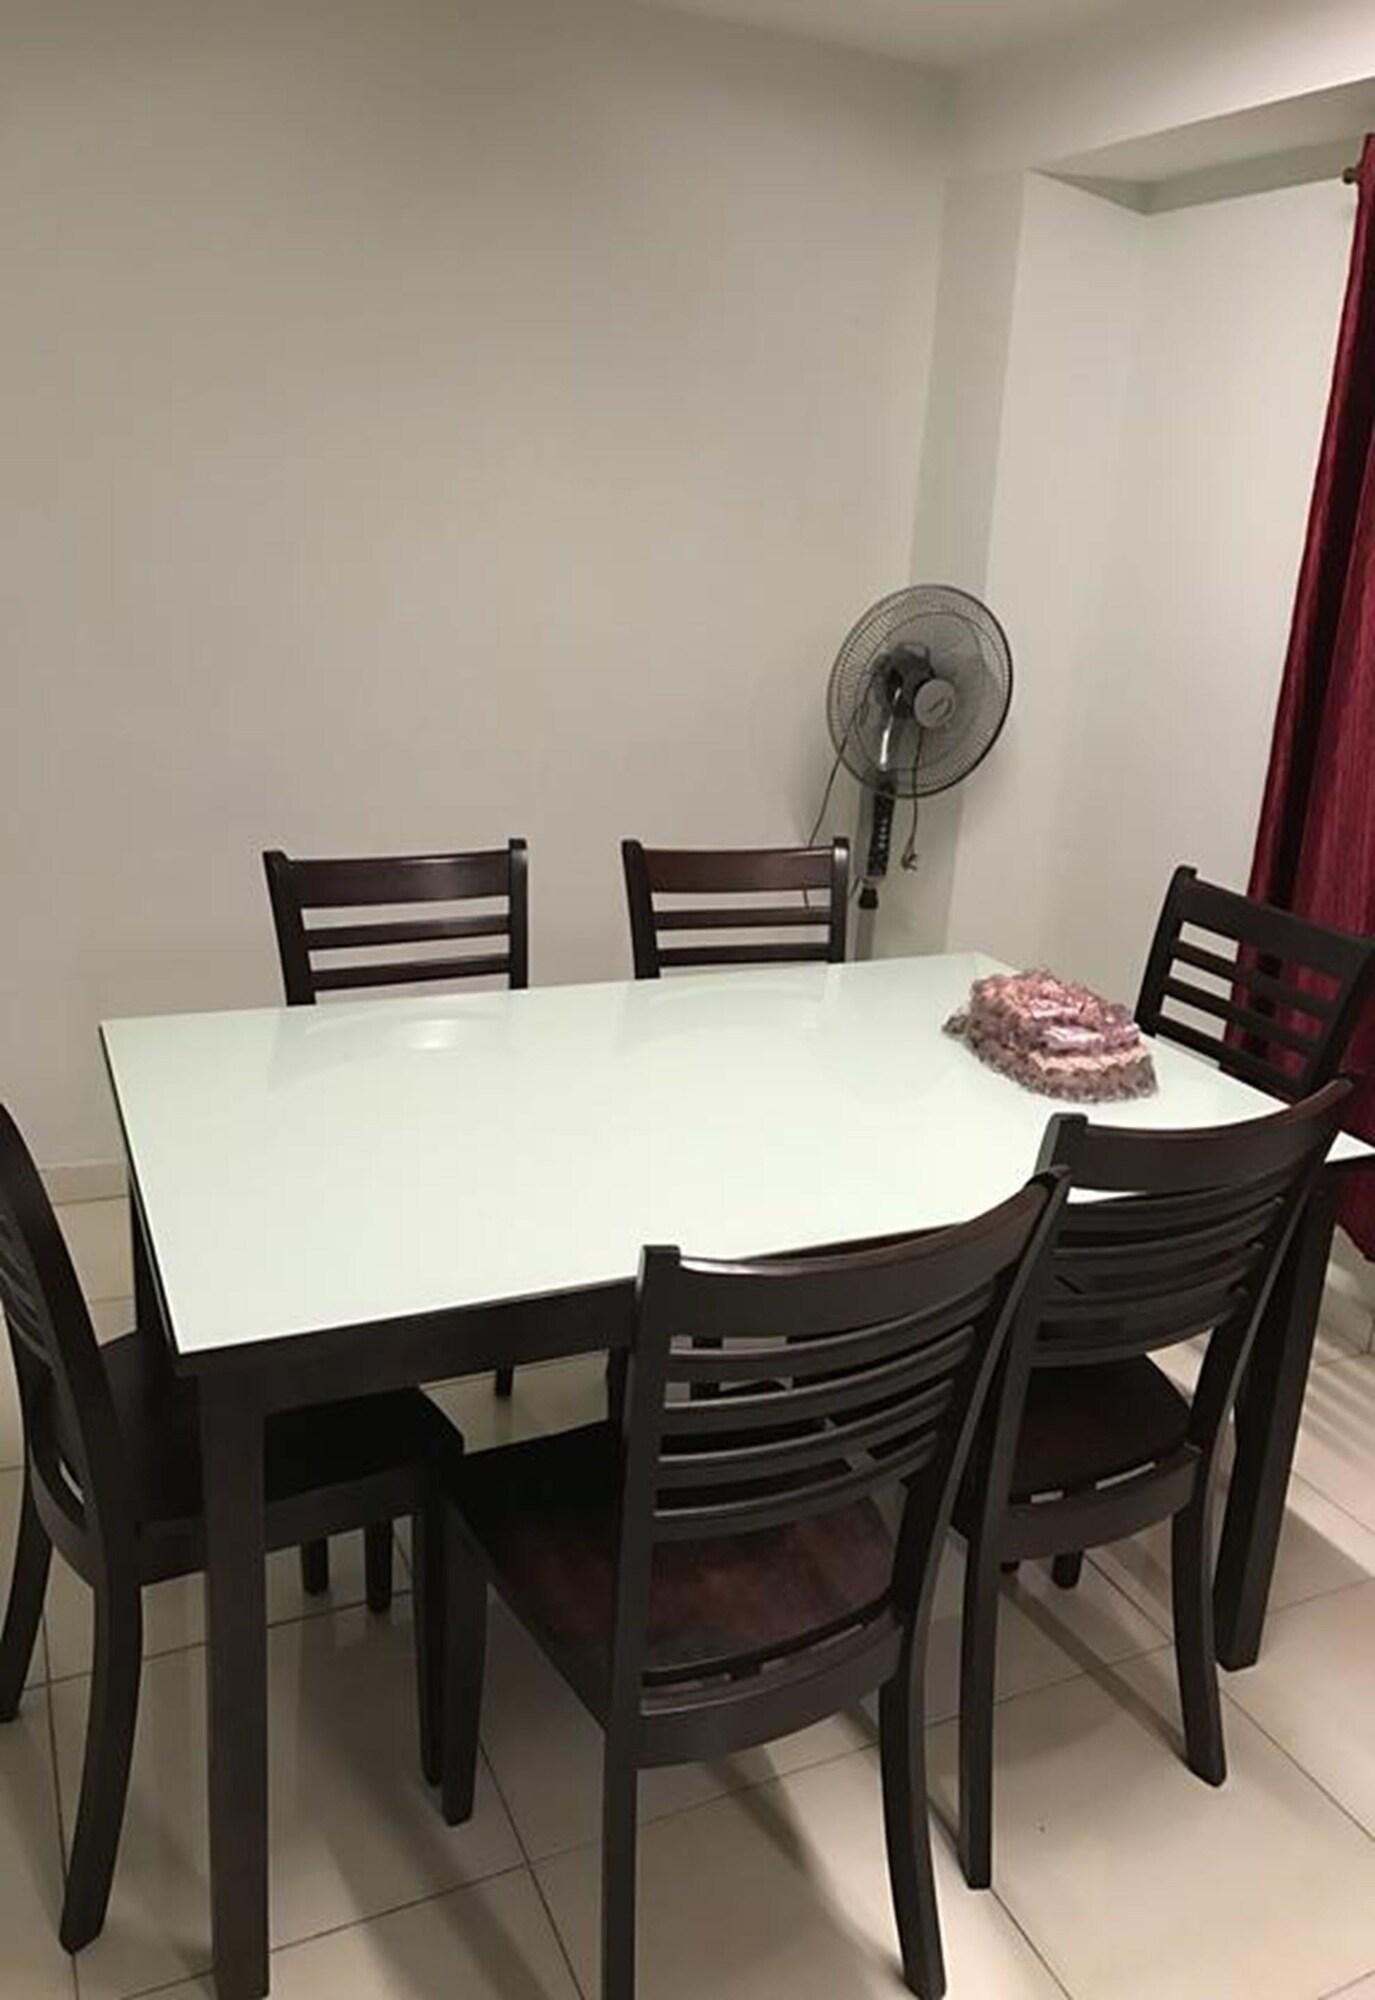 Kerteh Damansara Holiday Home, Kemaman